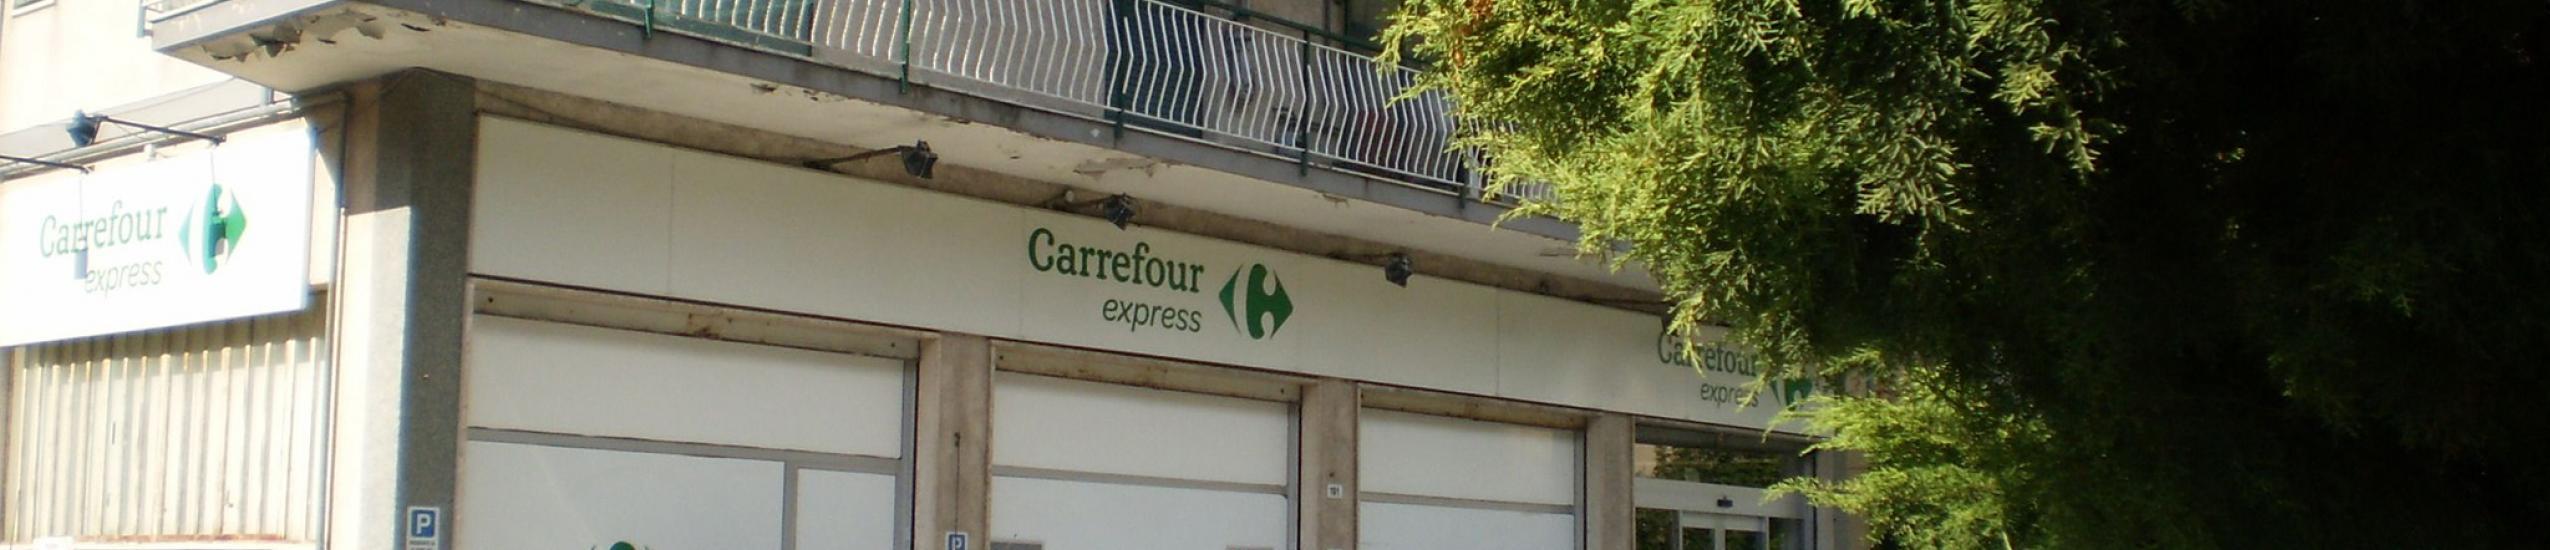 Carrefour Exspress